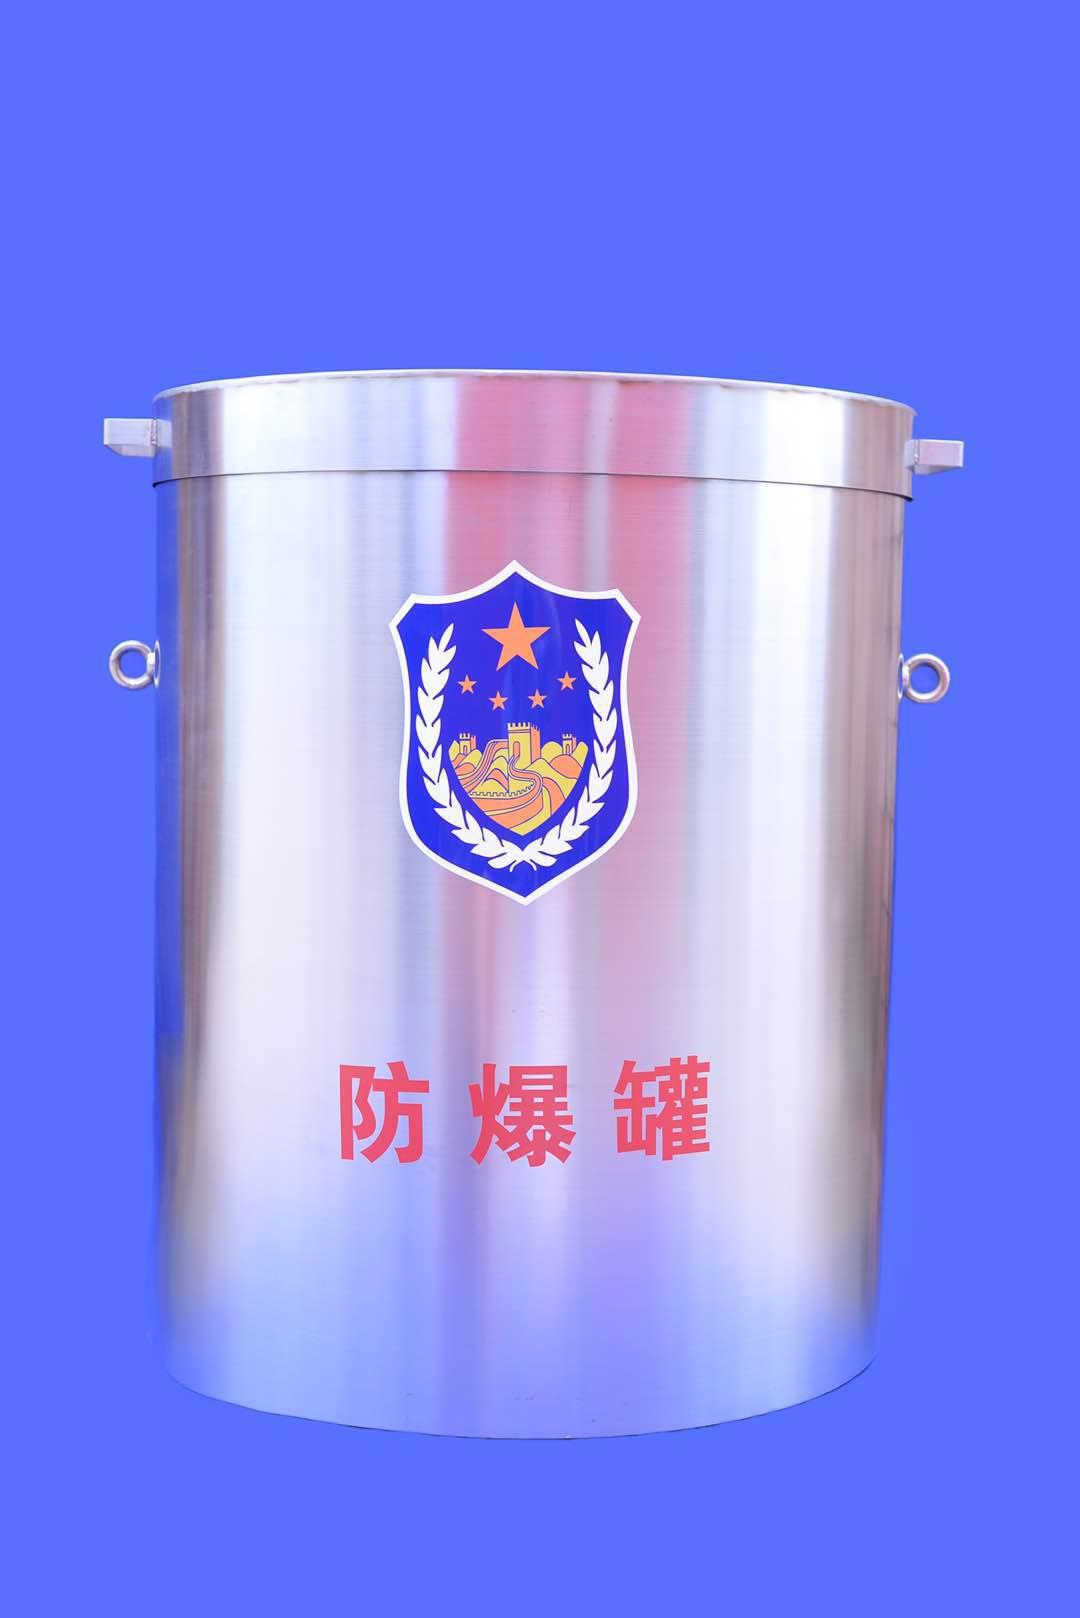 FBG-G1.5防爆罐II型 (双层复合罐)